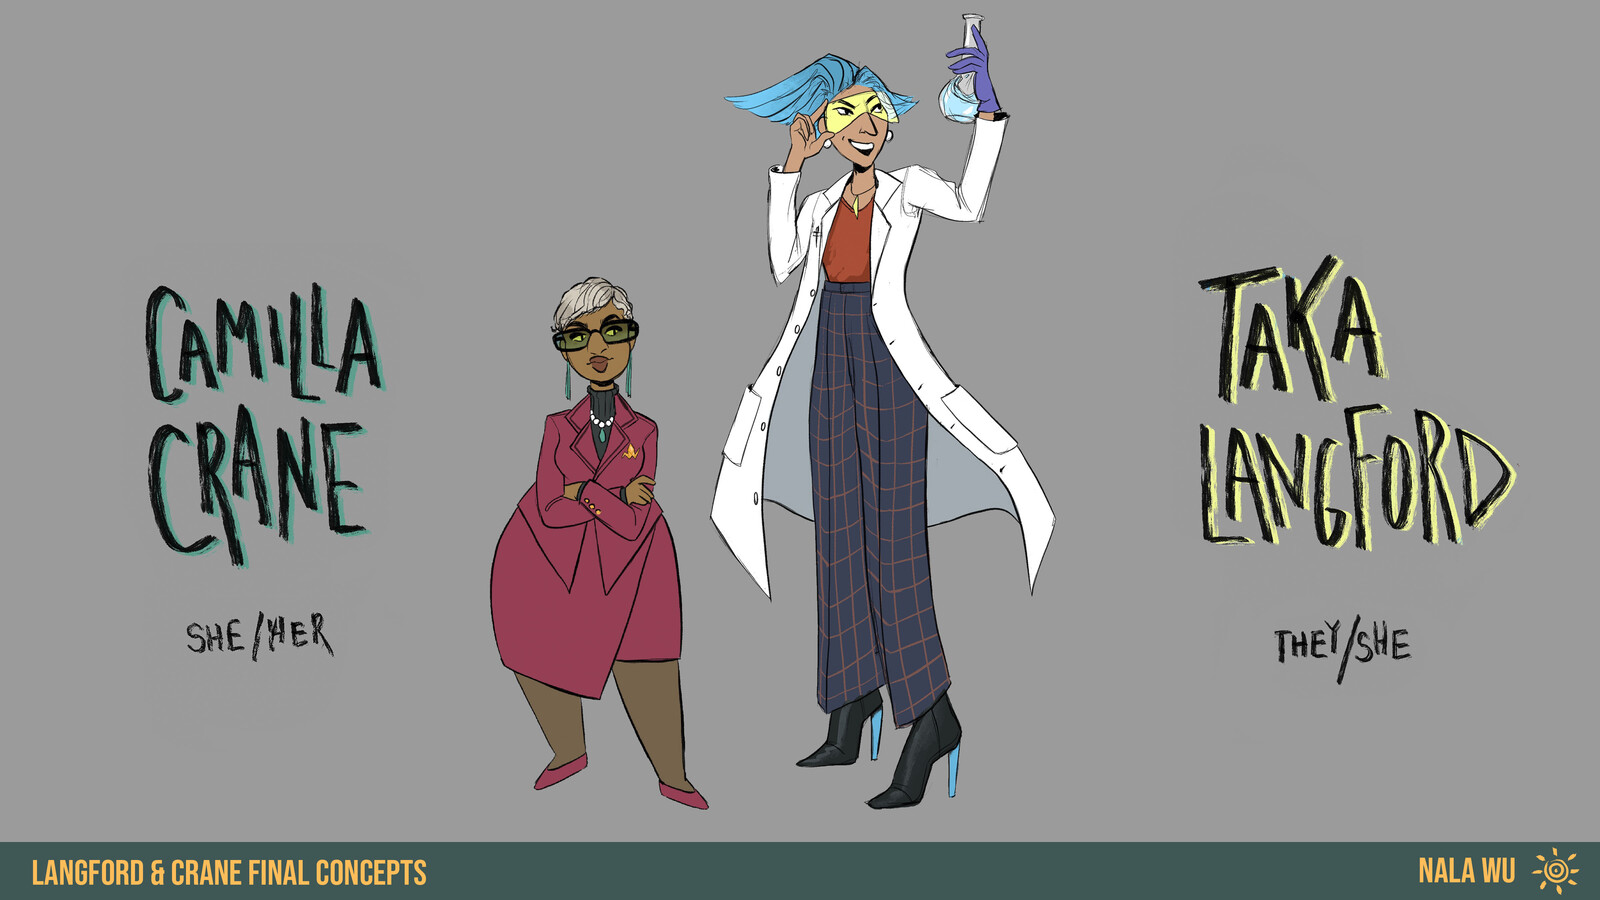 Character Design - Langford & Crane